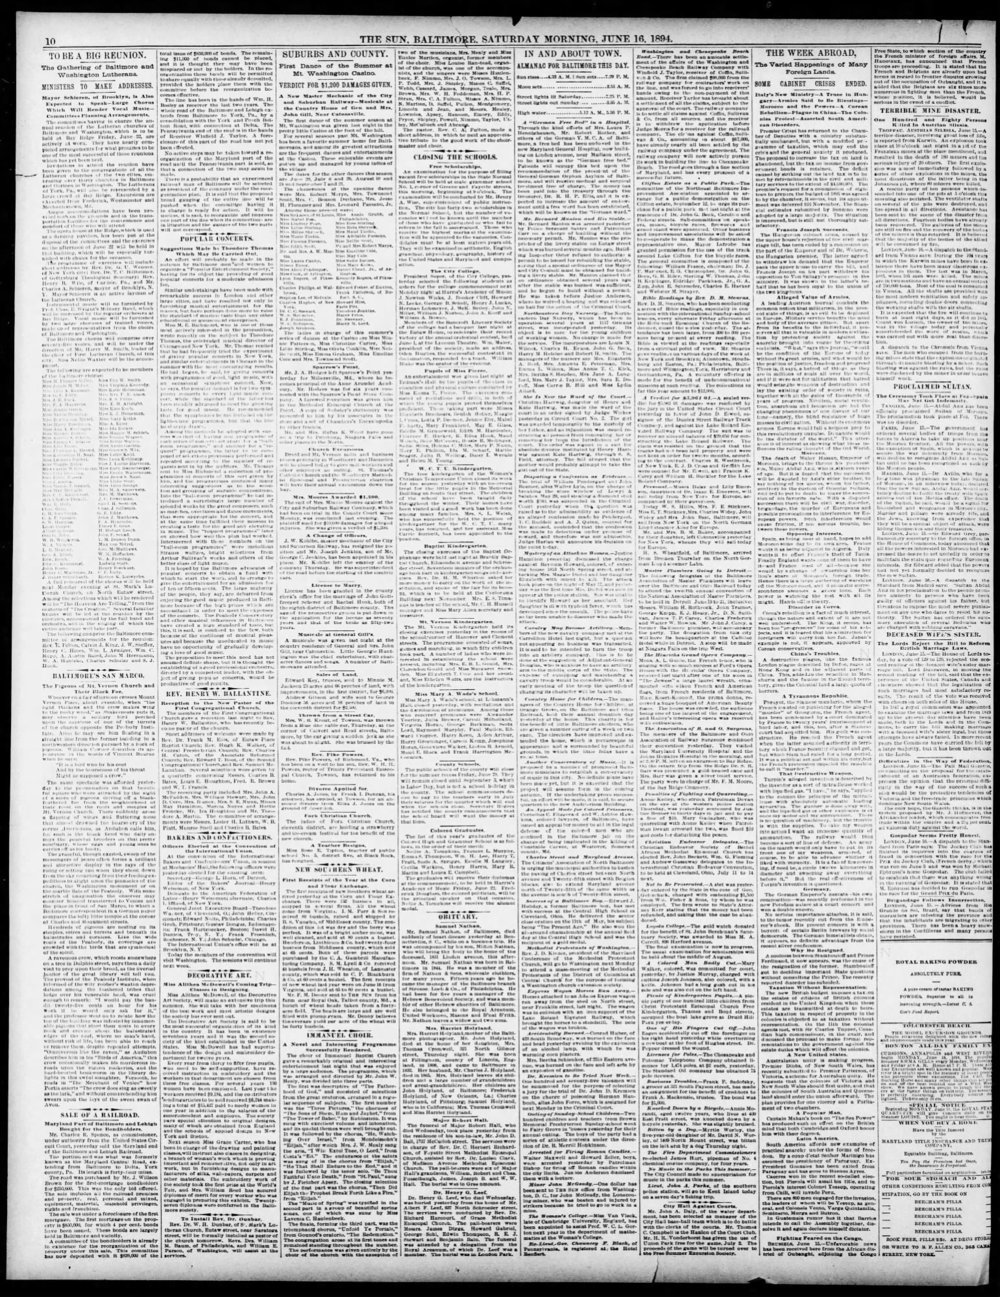 1894-6-16-coloredgrads.jpg